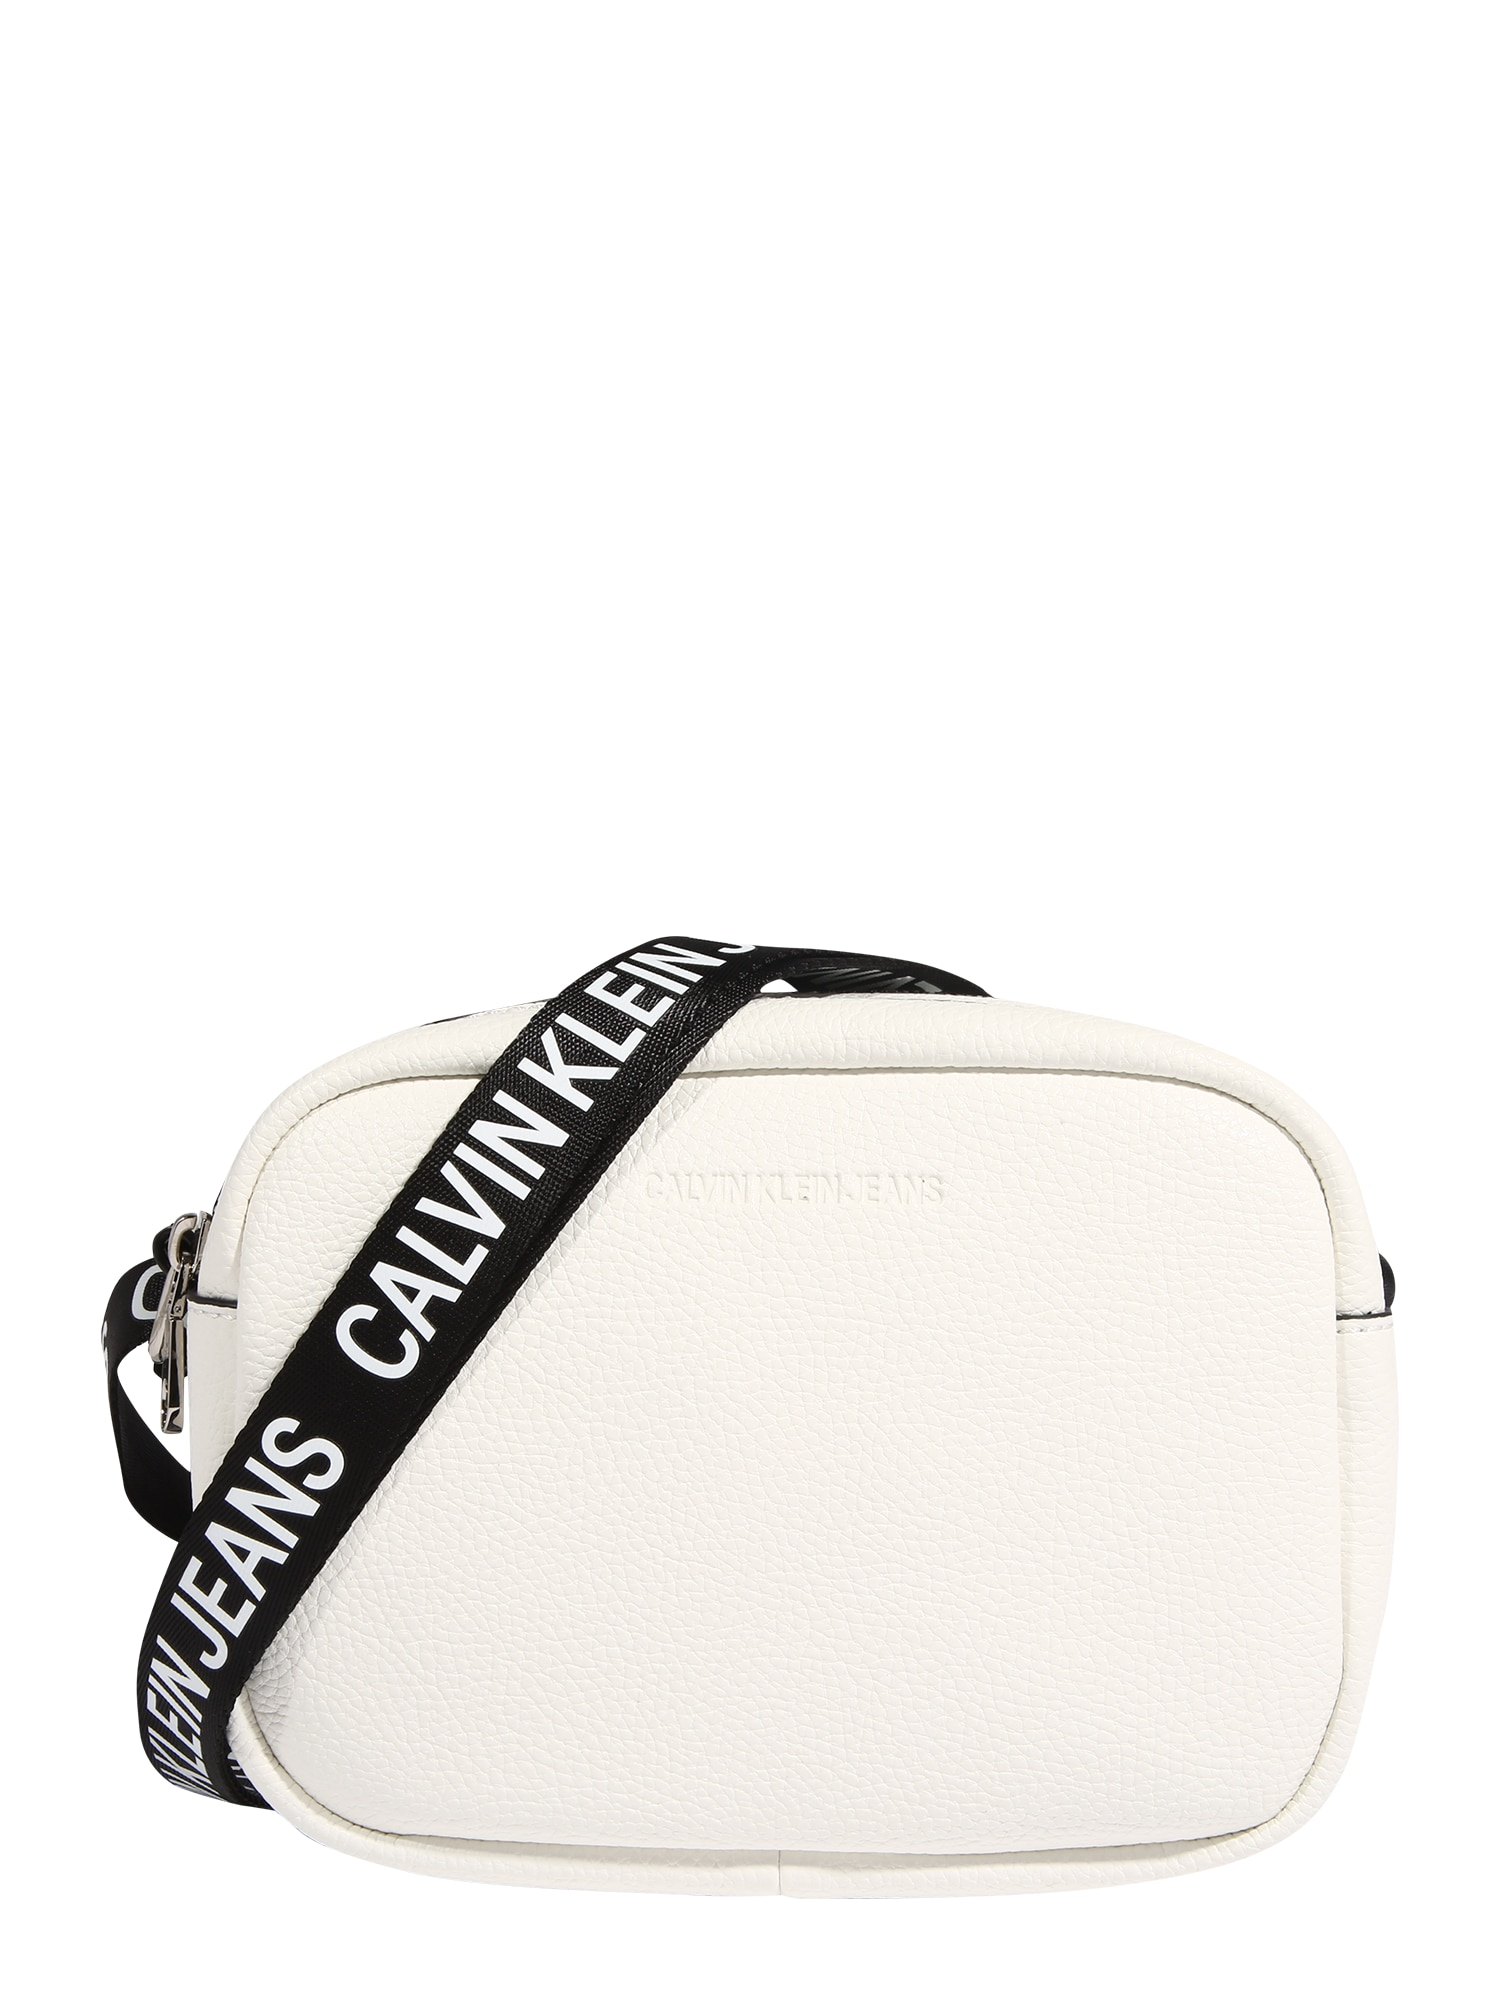 Calvin Klein Jeans Taška přes rameno  bílá / černá